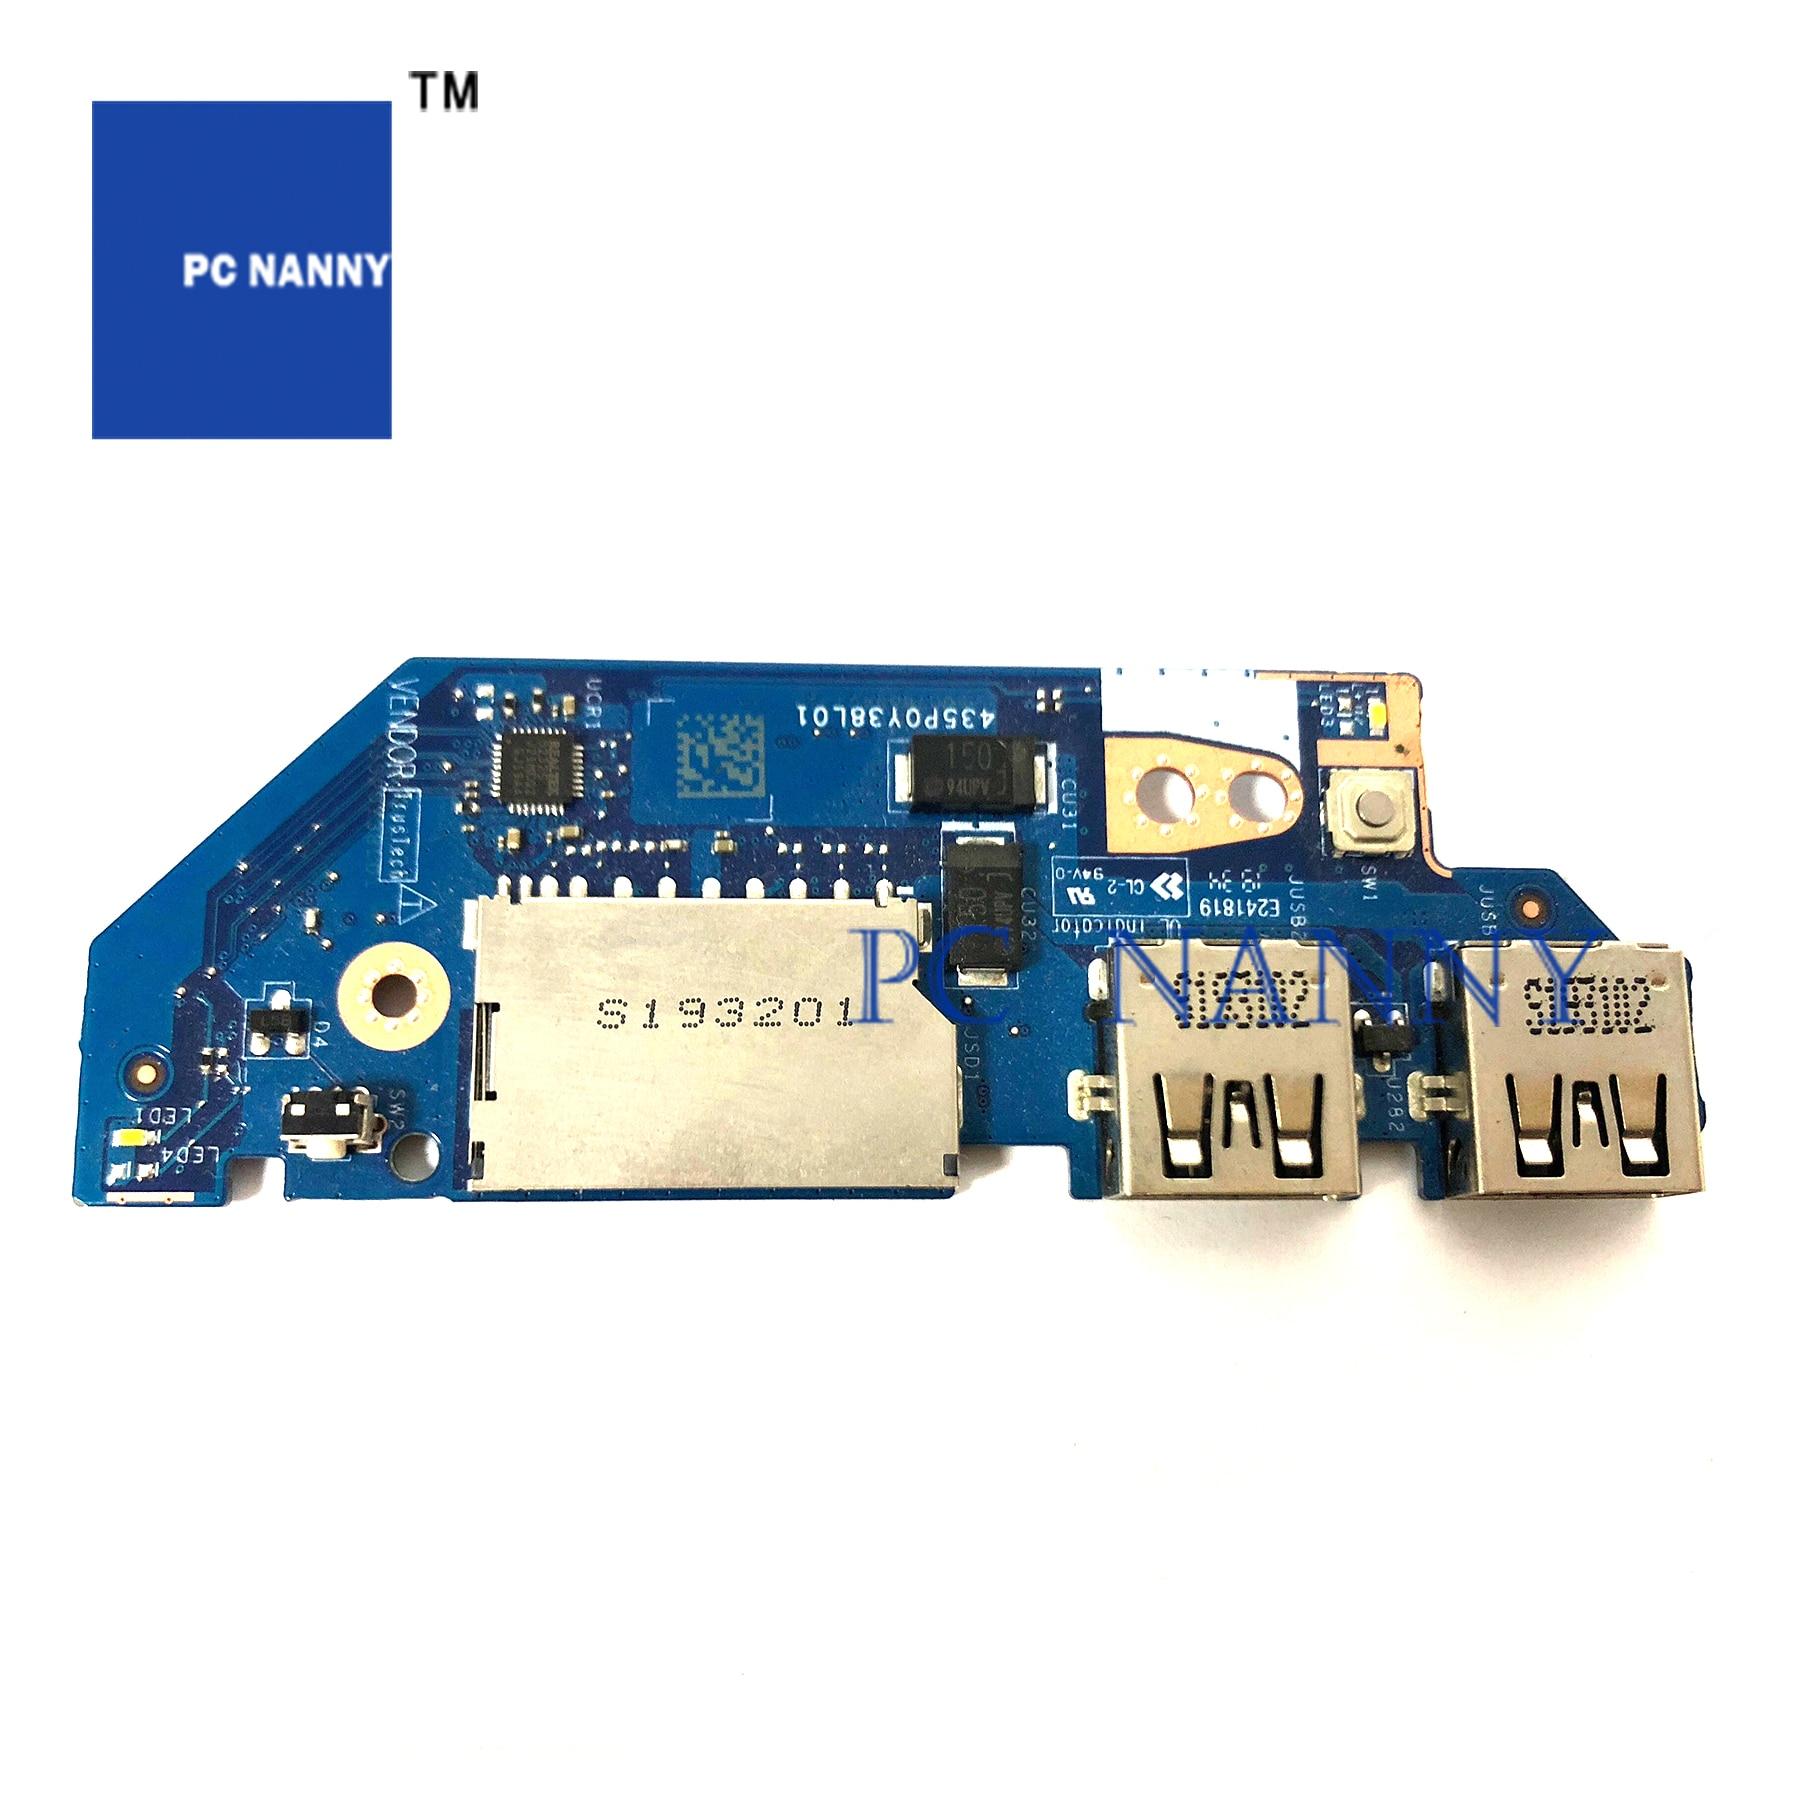 PCNANNY FÜR FL535 LS-H10GP usb power board